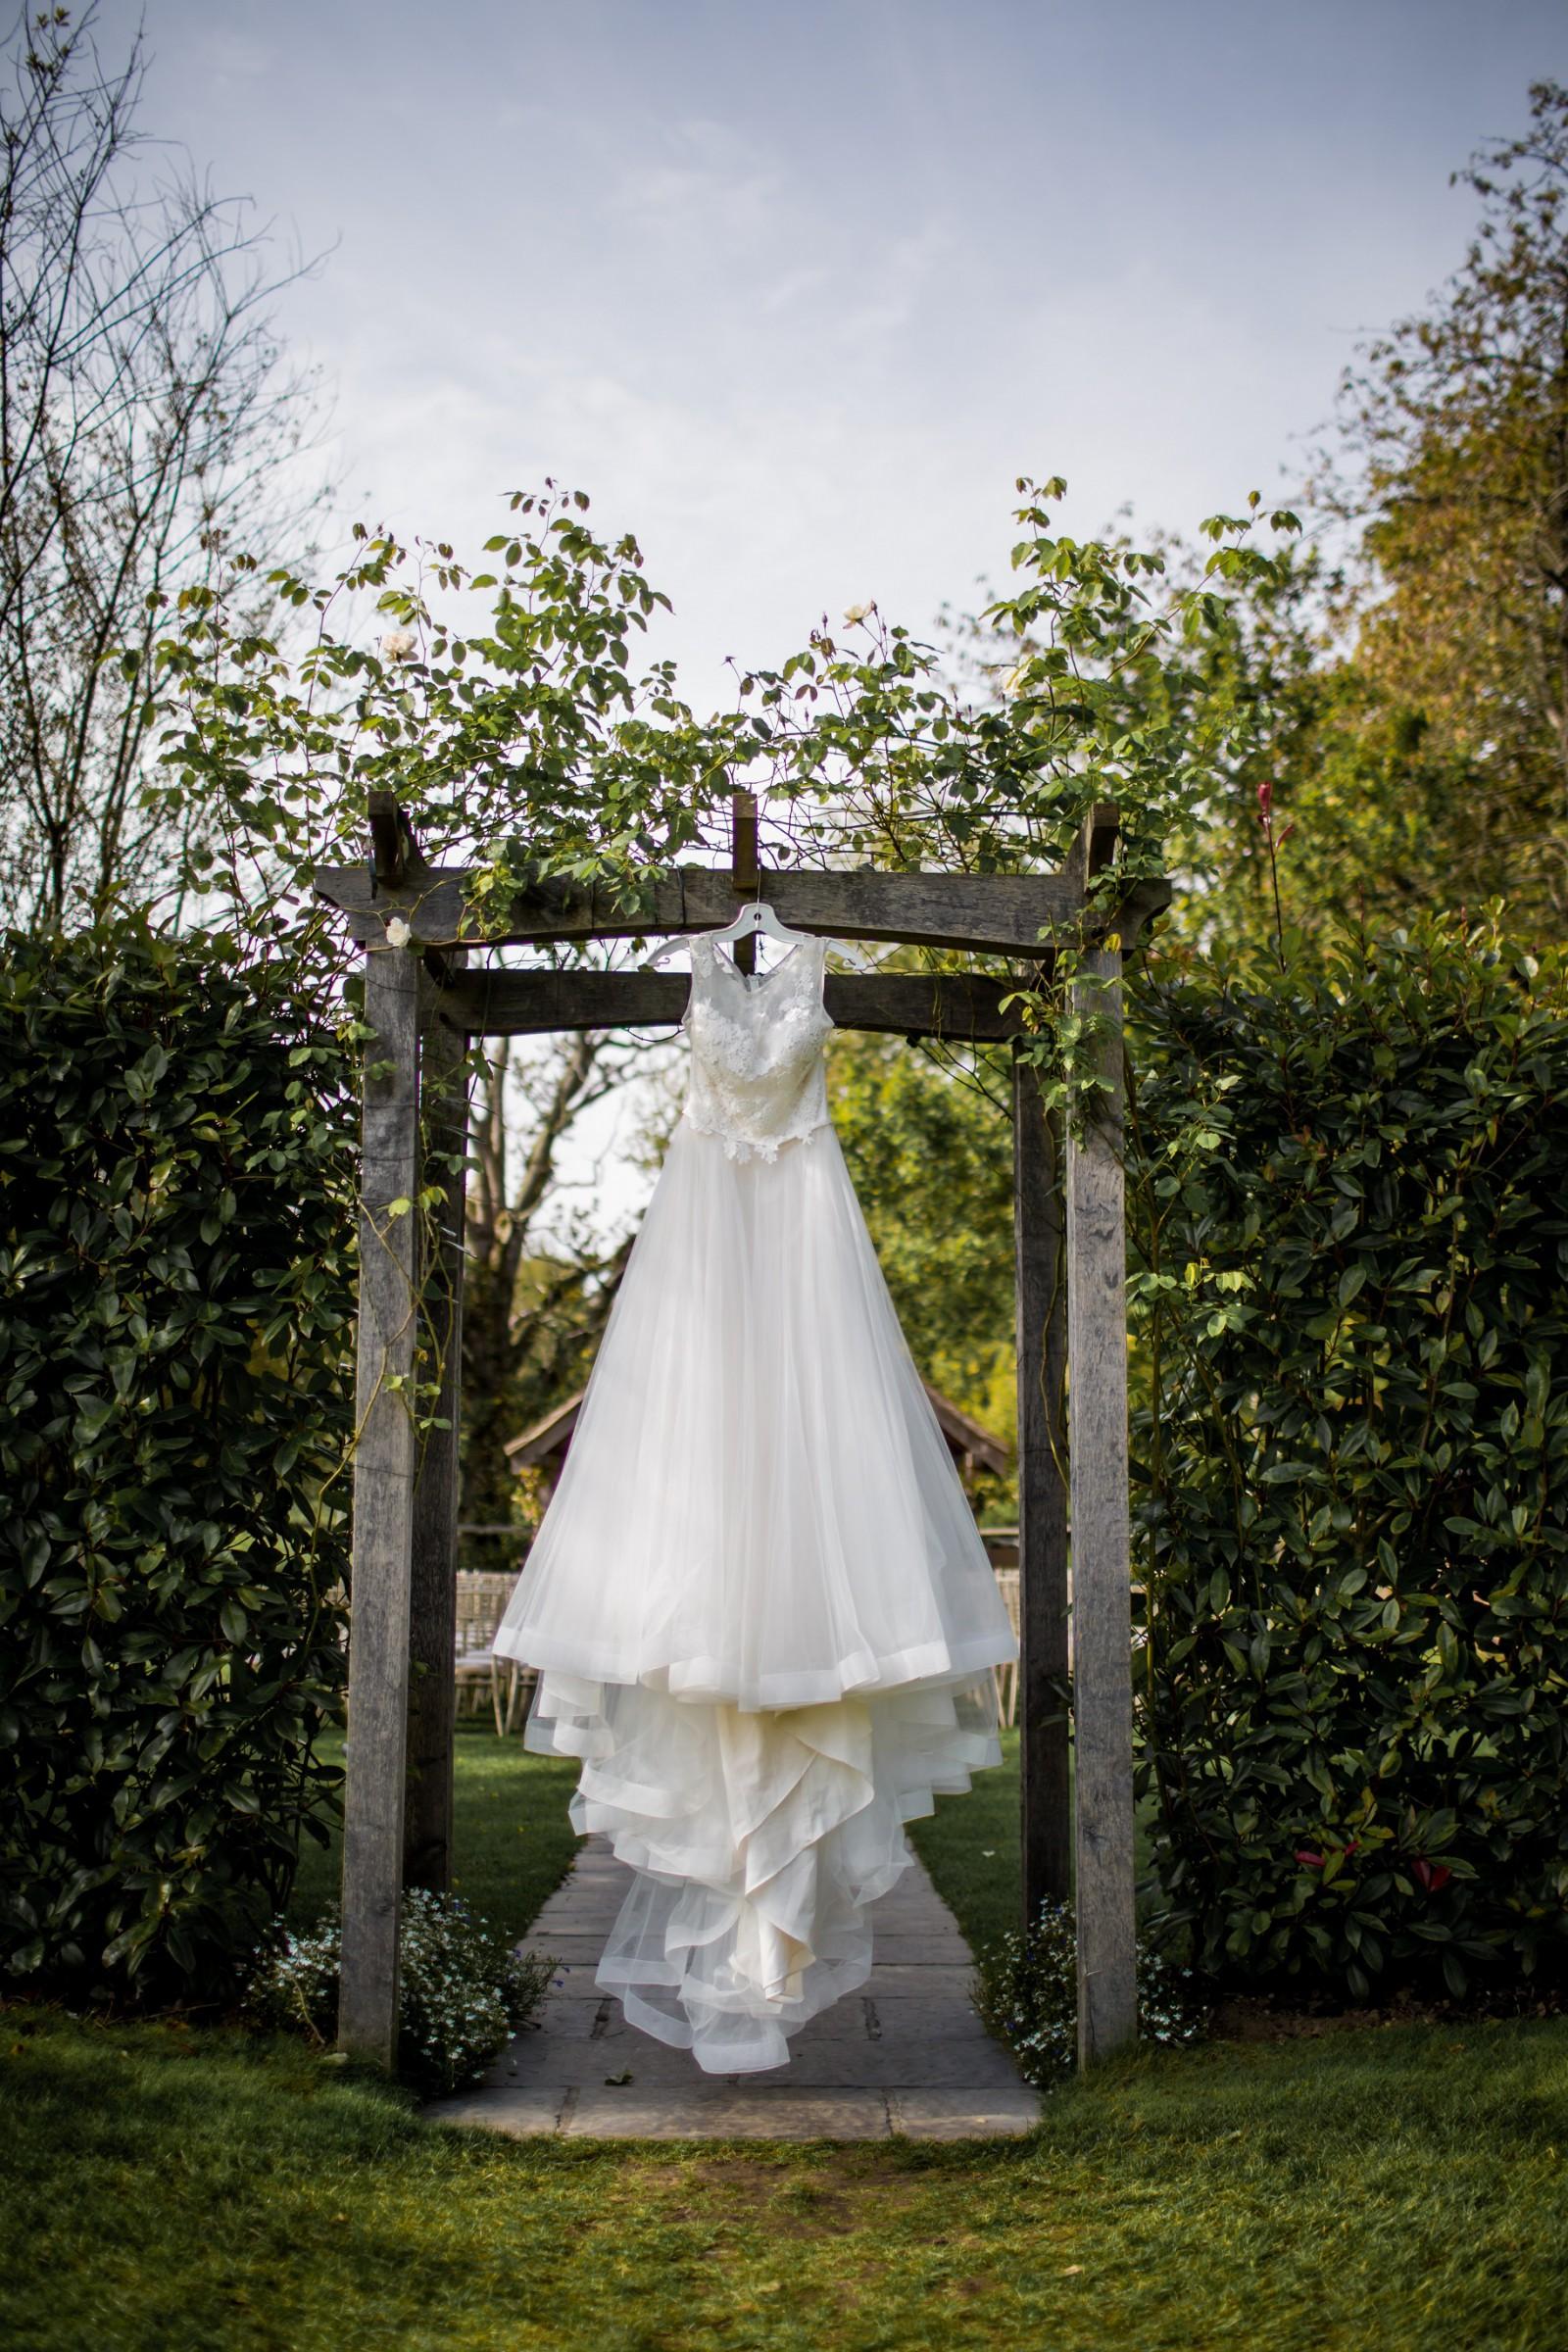 Paloma blanca style 2085 second hand wedding dress on for Second hand wedding dresses london